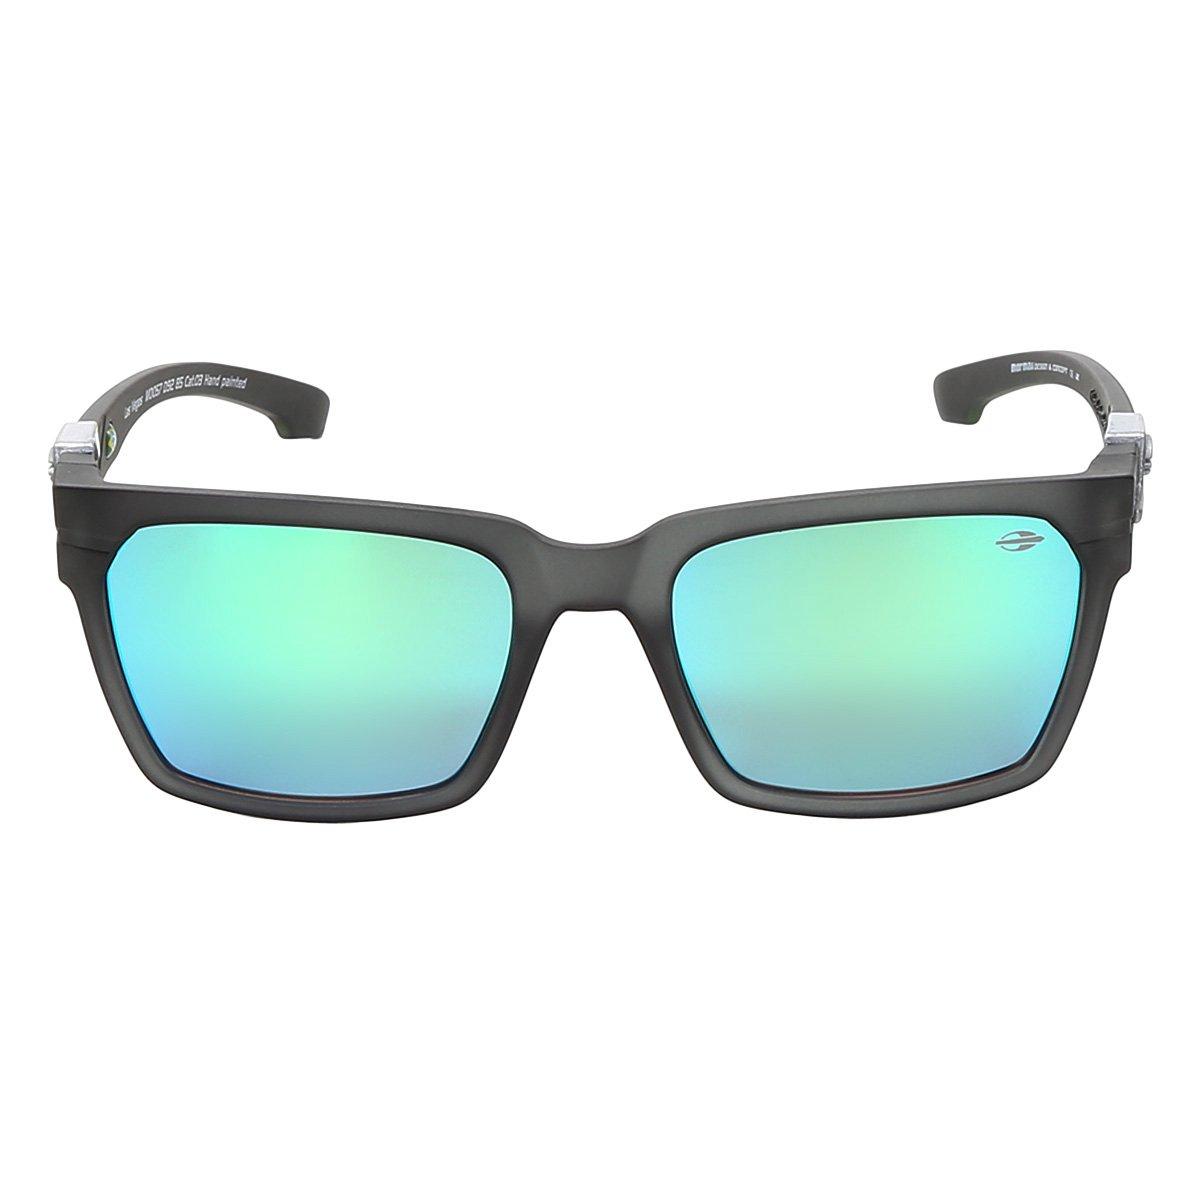 1a21ec2ce3a71 Óculos de Sol Mormaii Las Vegas Masculino - Compre Agora   Zattini